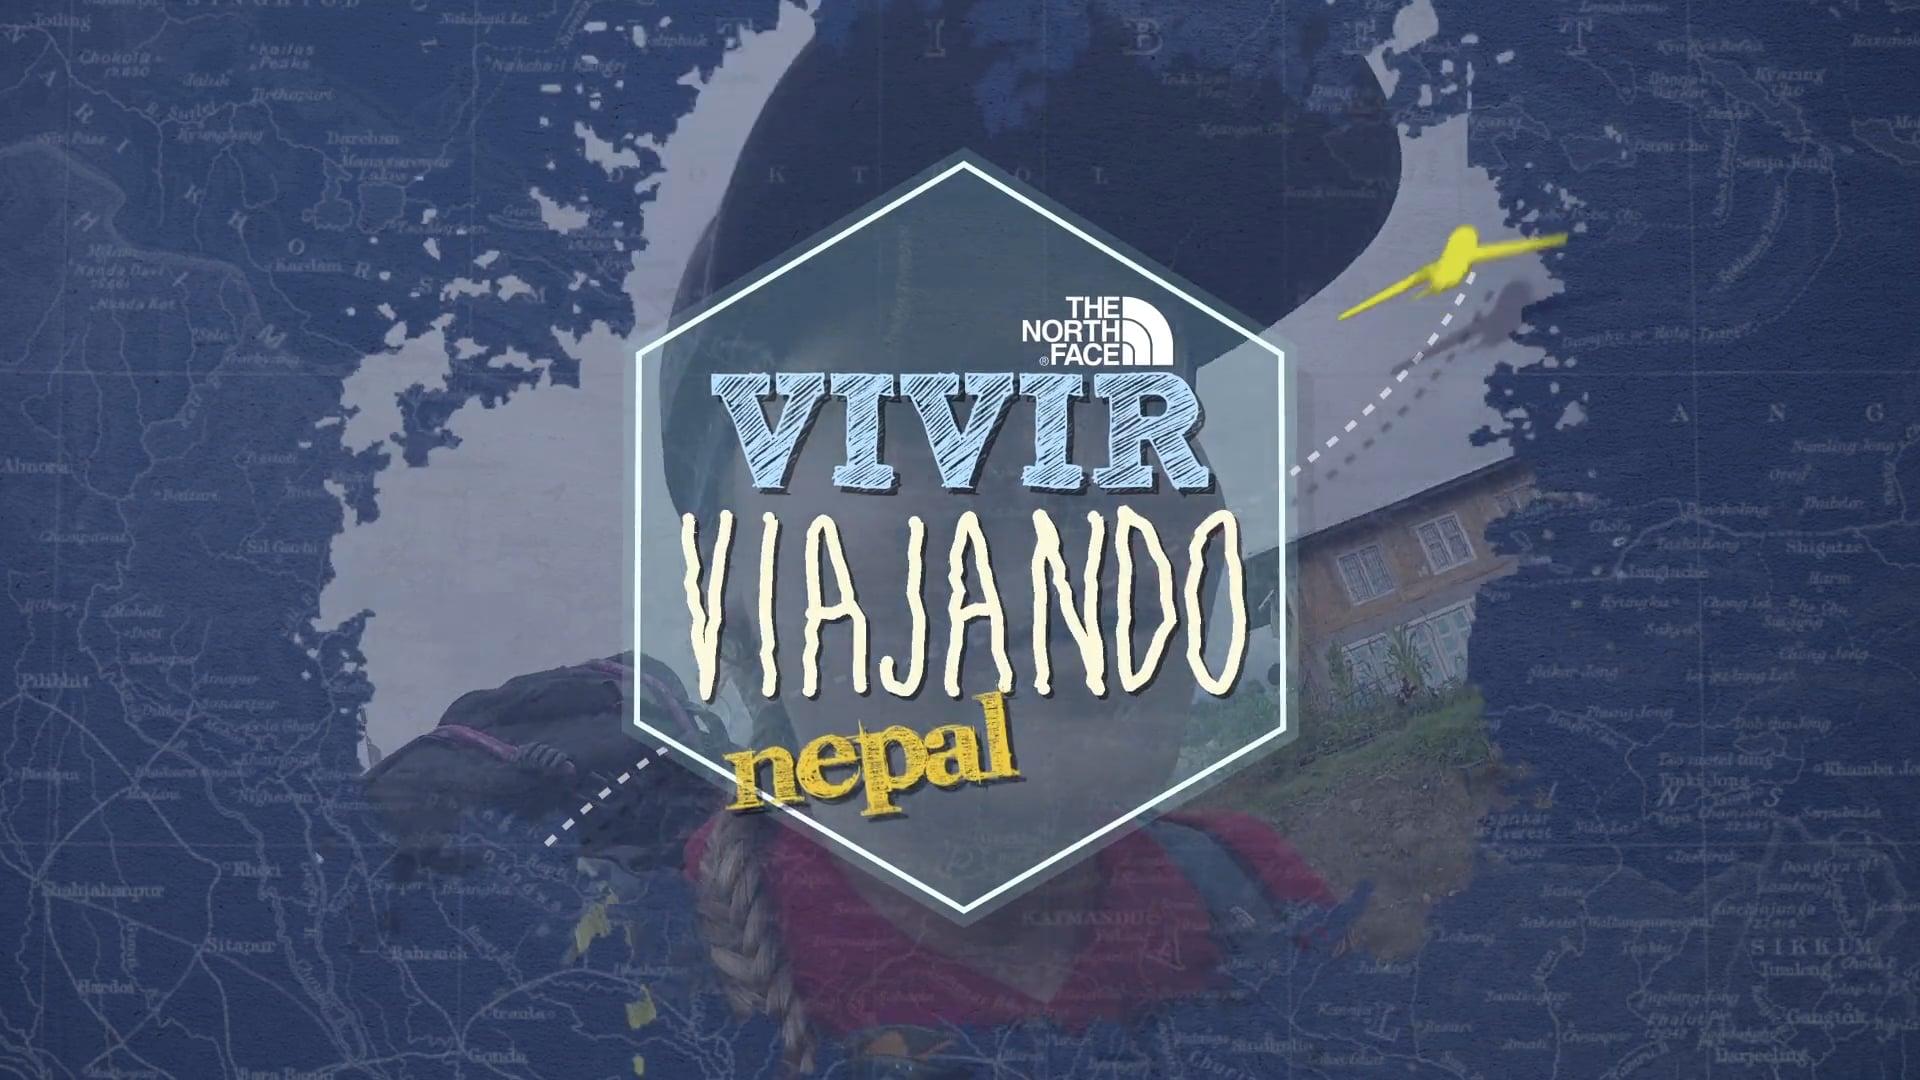 VIVIR VIAJANDO NEPAL PROMO 3MIN TNF